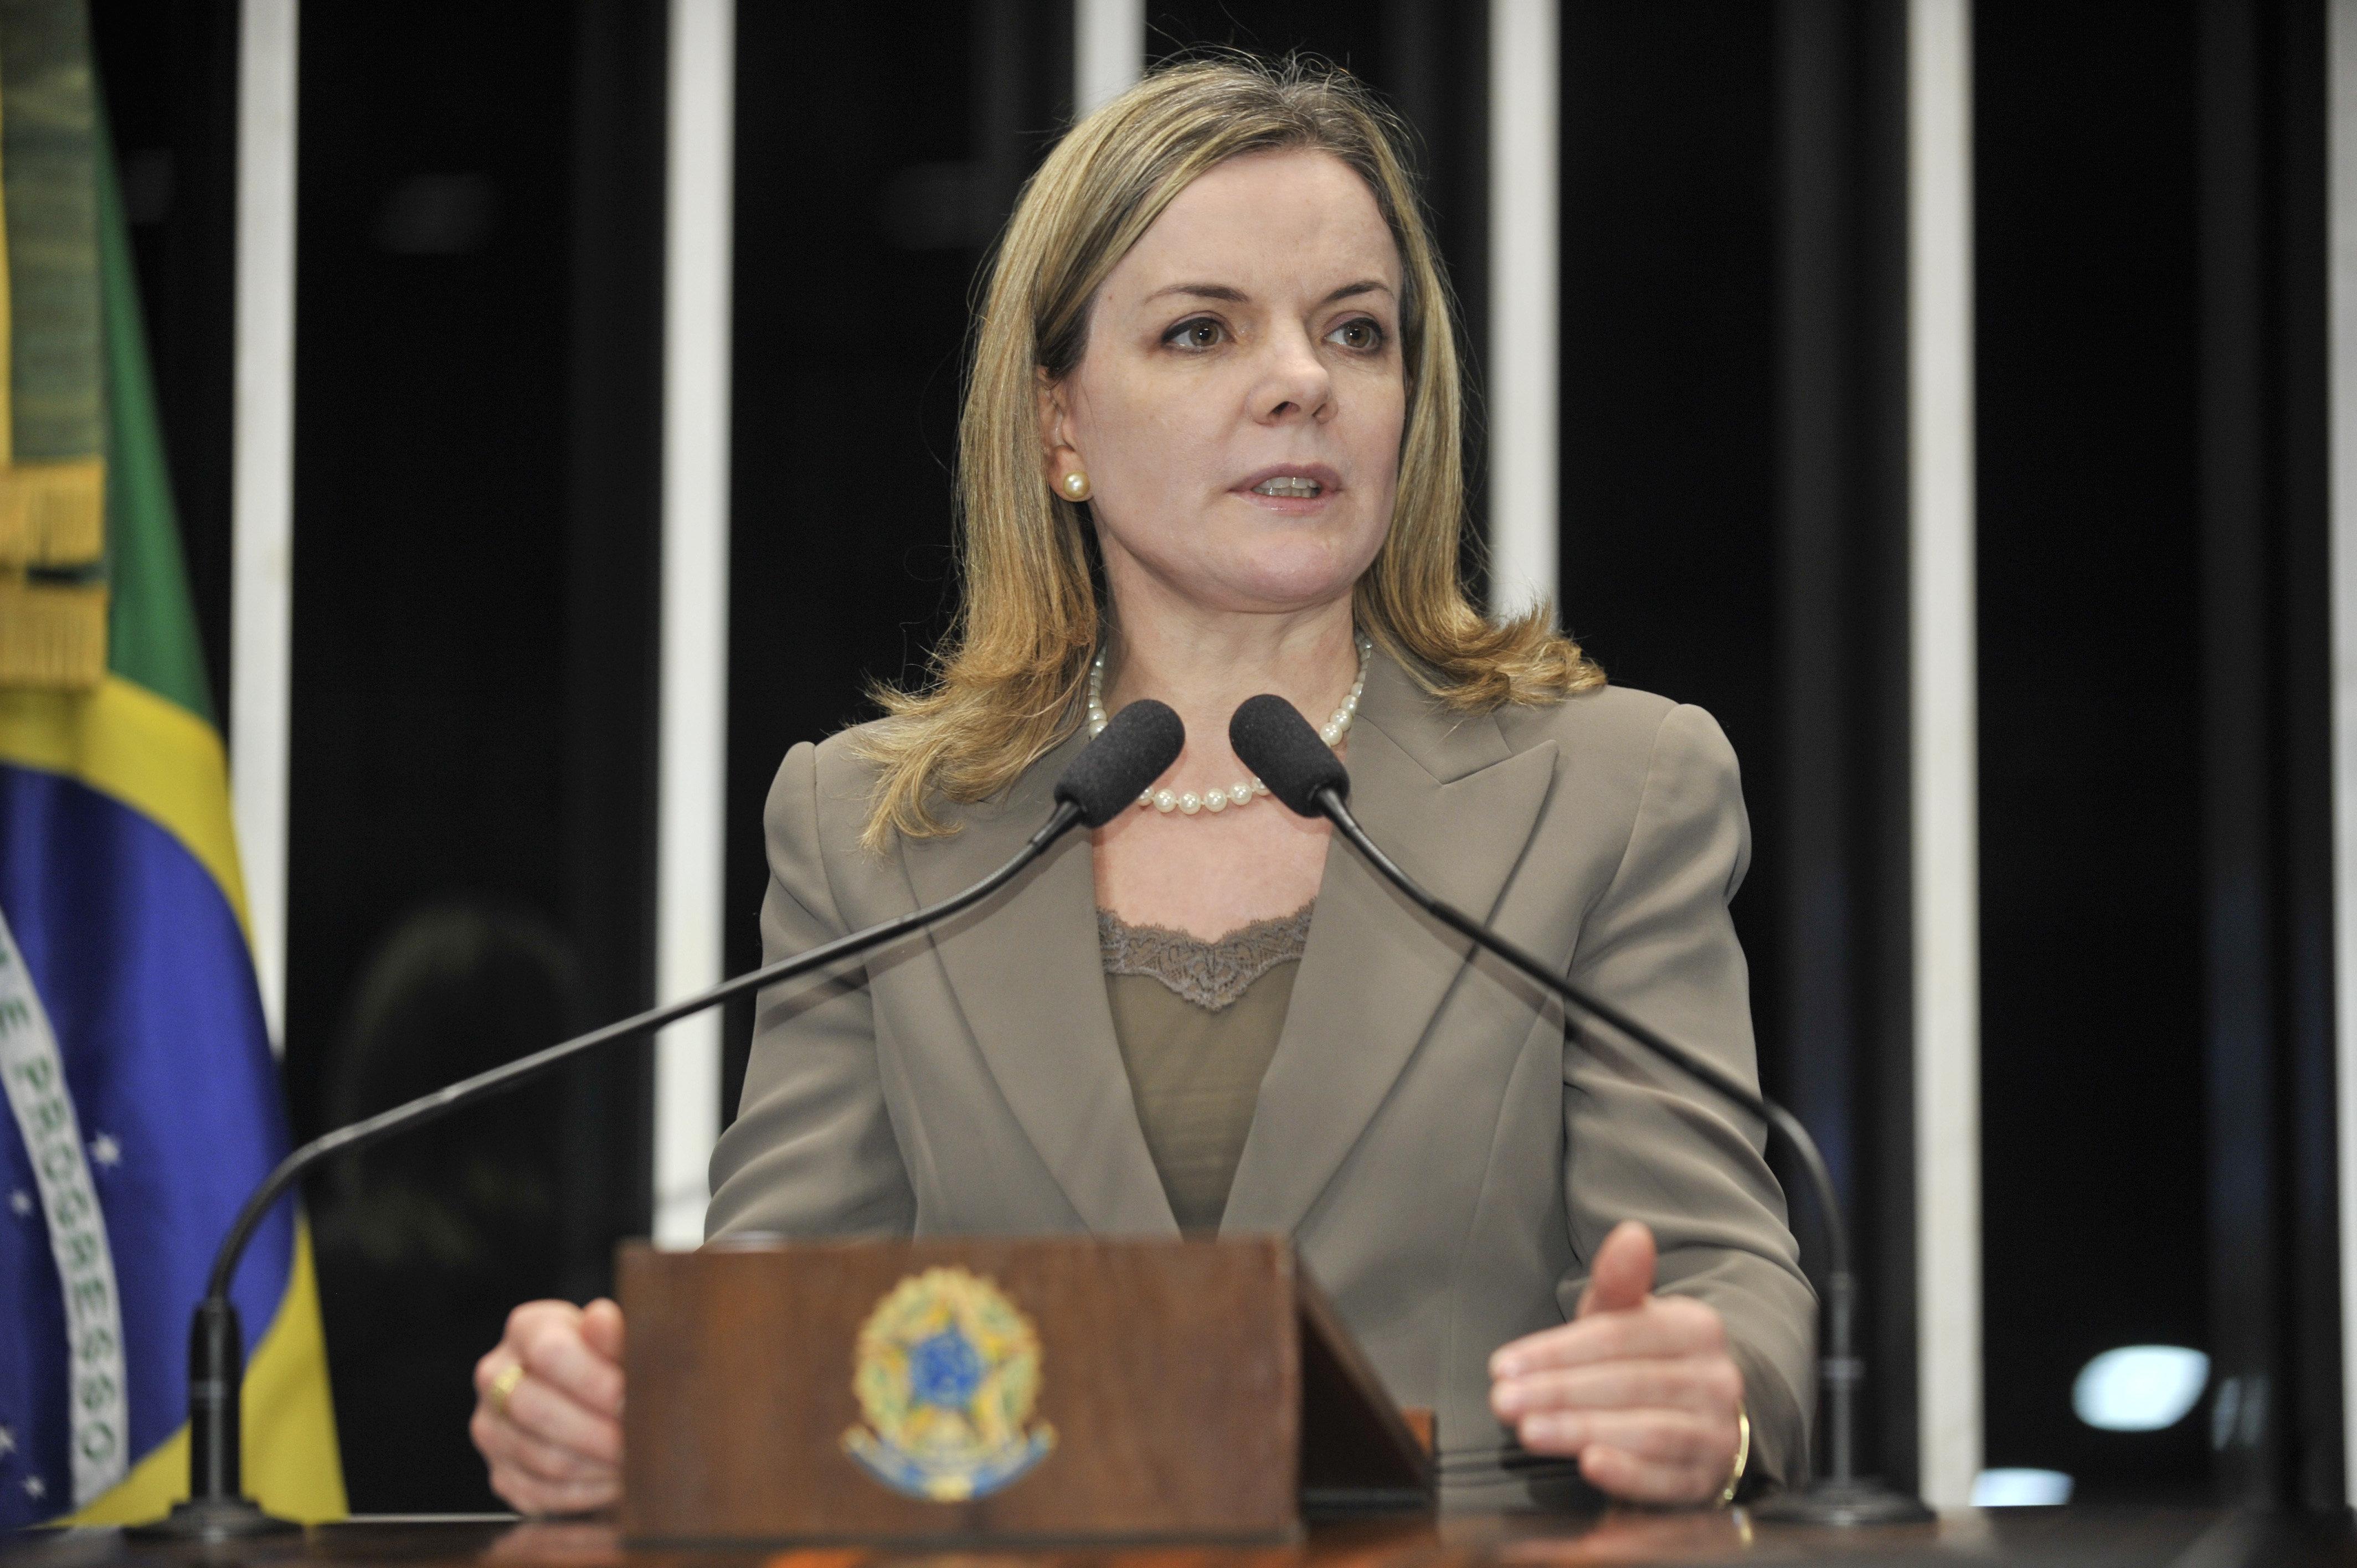 Senadora Gleisi Hoffmann (PT-PR) | Foto: Waldemir Barreto/ Agência Senado